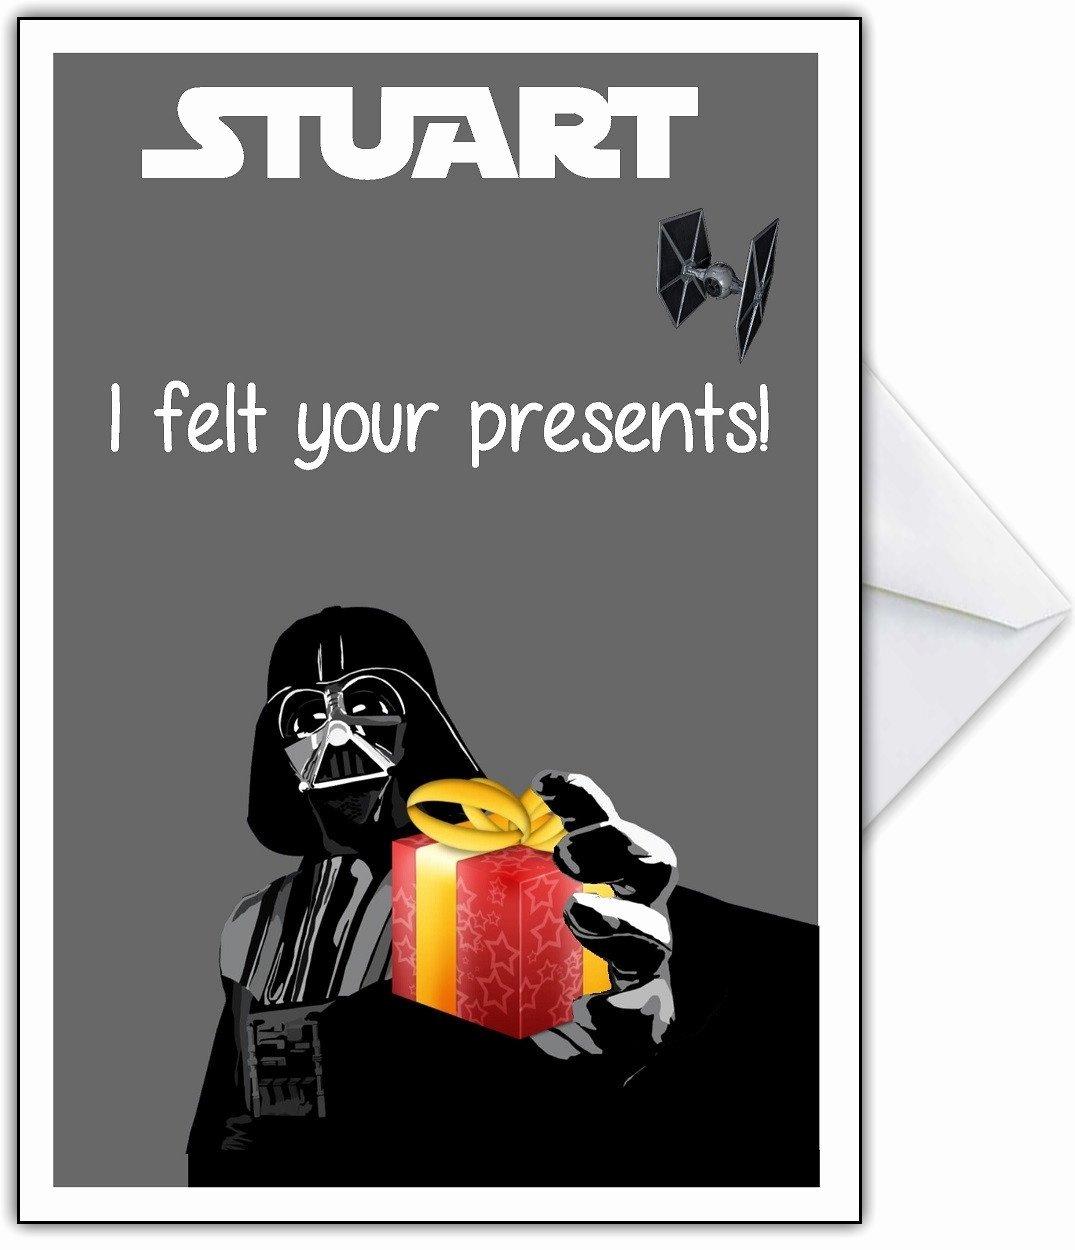 Star Wars Birthday Card Printable Best Of Funny Star Wars Birthday Card – that Card Shop